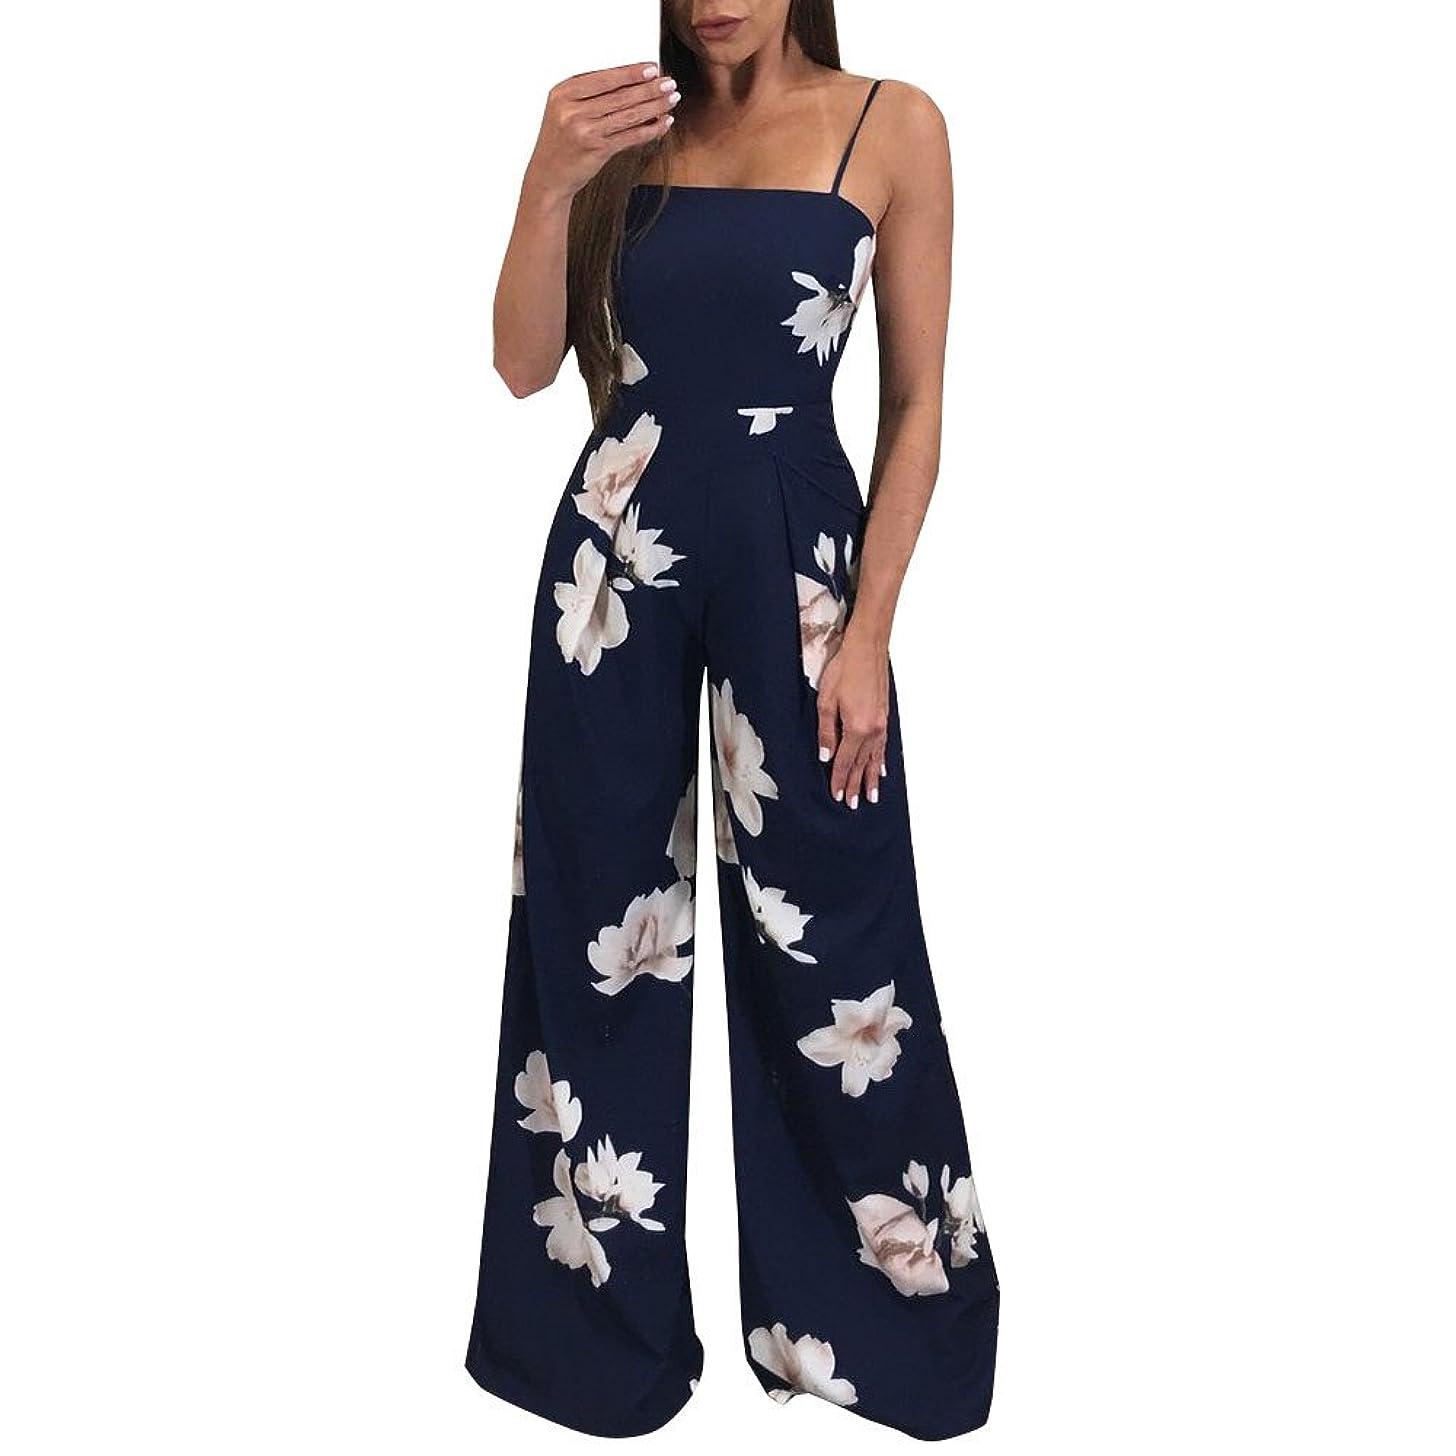 Hotkey Women's Dresses Women Ladies Clubwear Floral Playsuit Bodycon Party Jumpsuit Trousers Long Sleeve